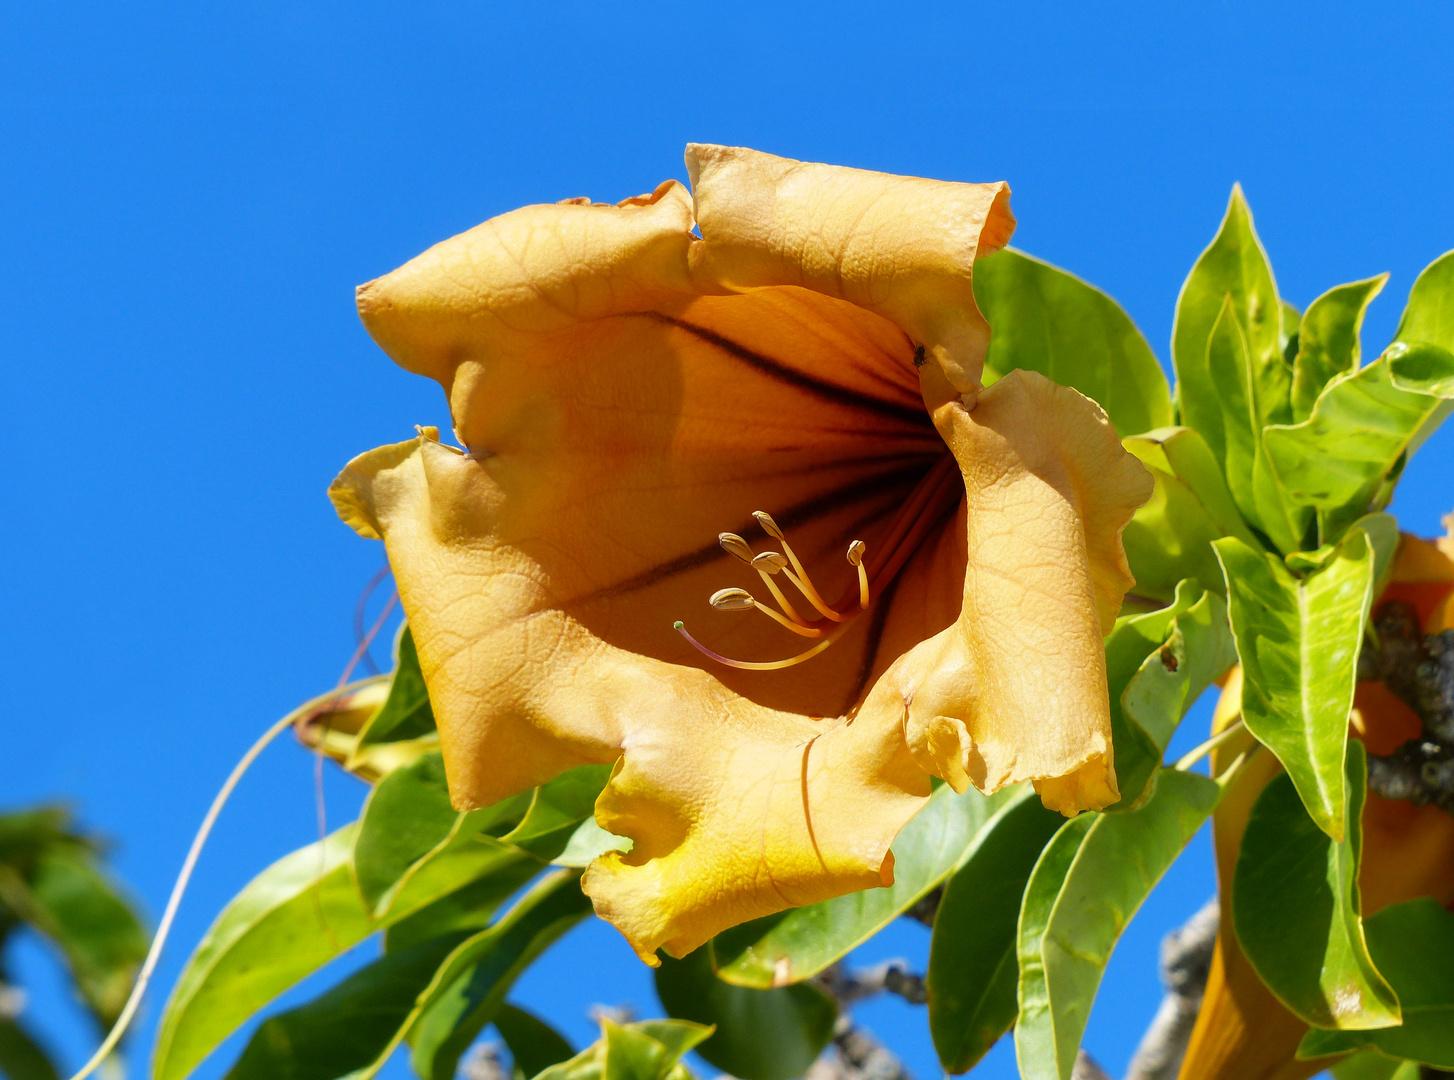 Big Yellow Exotic Flower Photo Image Flowers Nature Spain